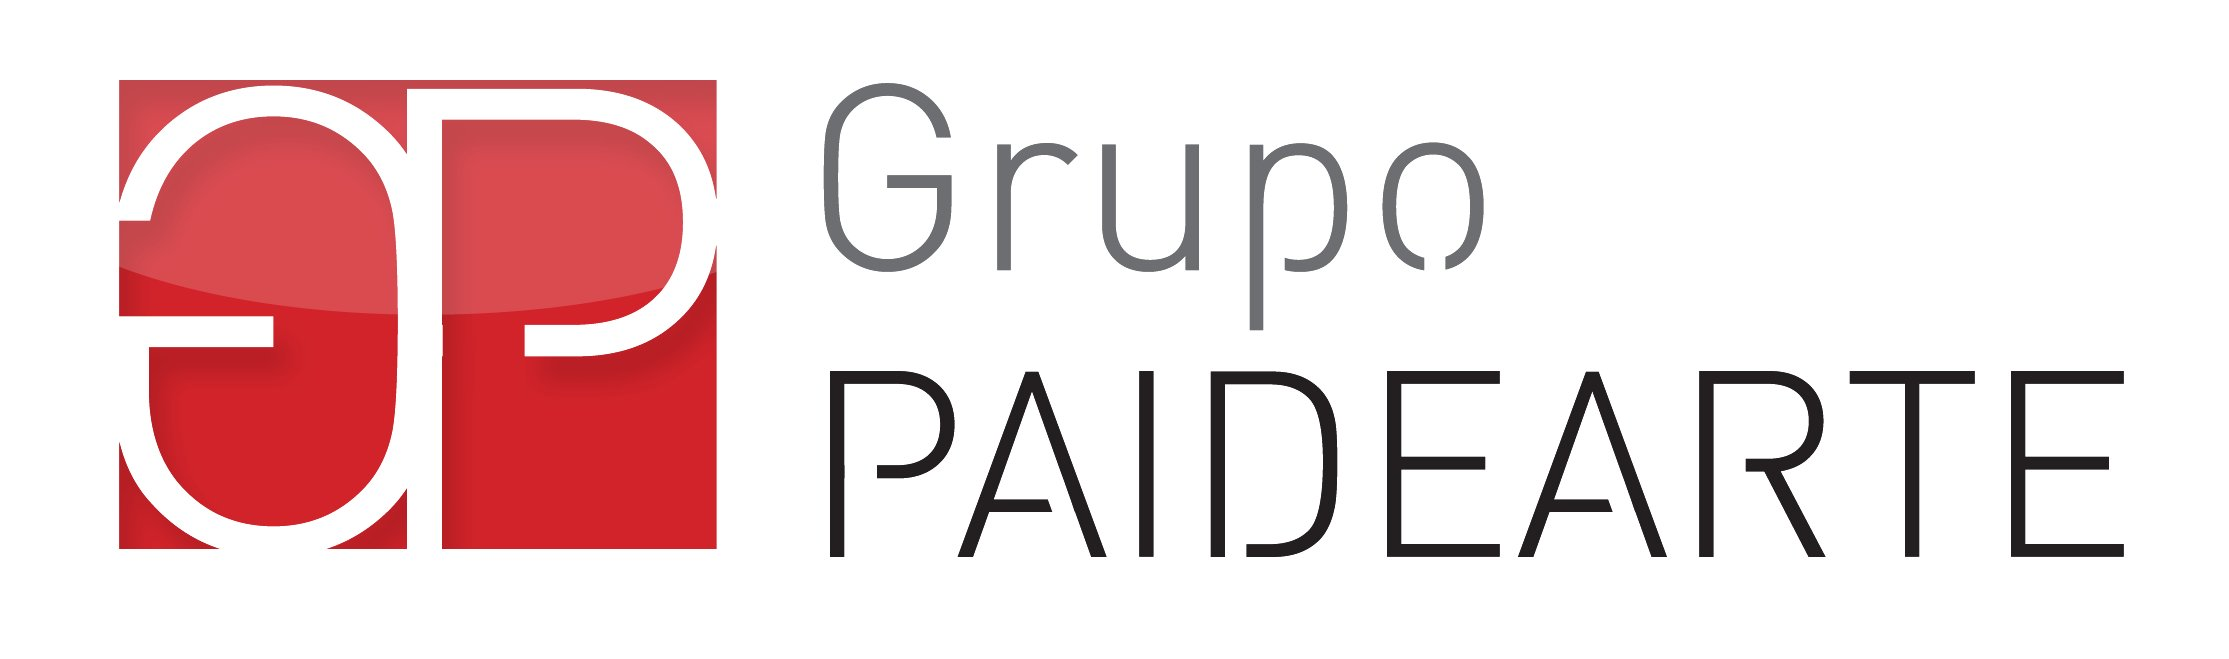 Grupo Paidearte s,l